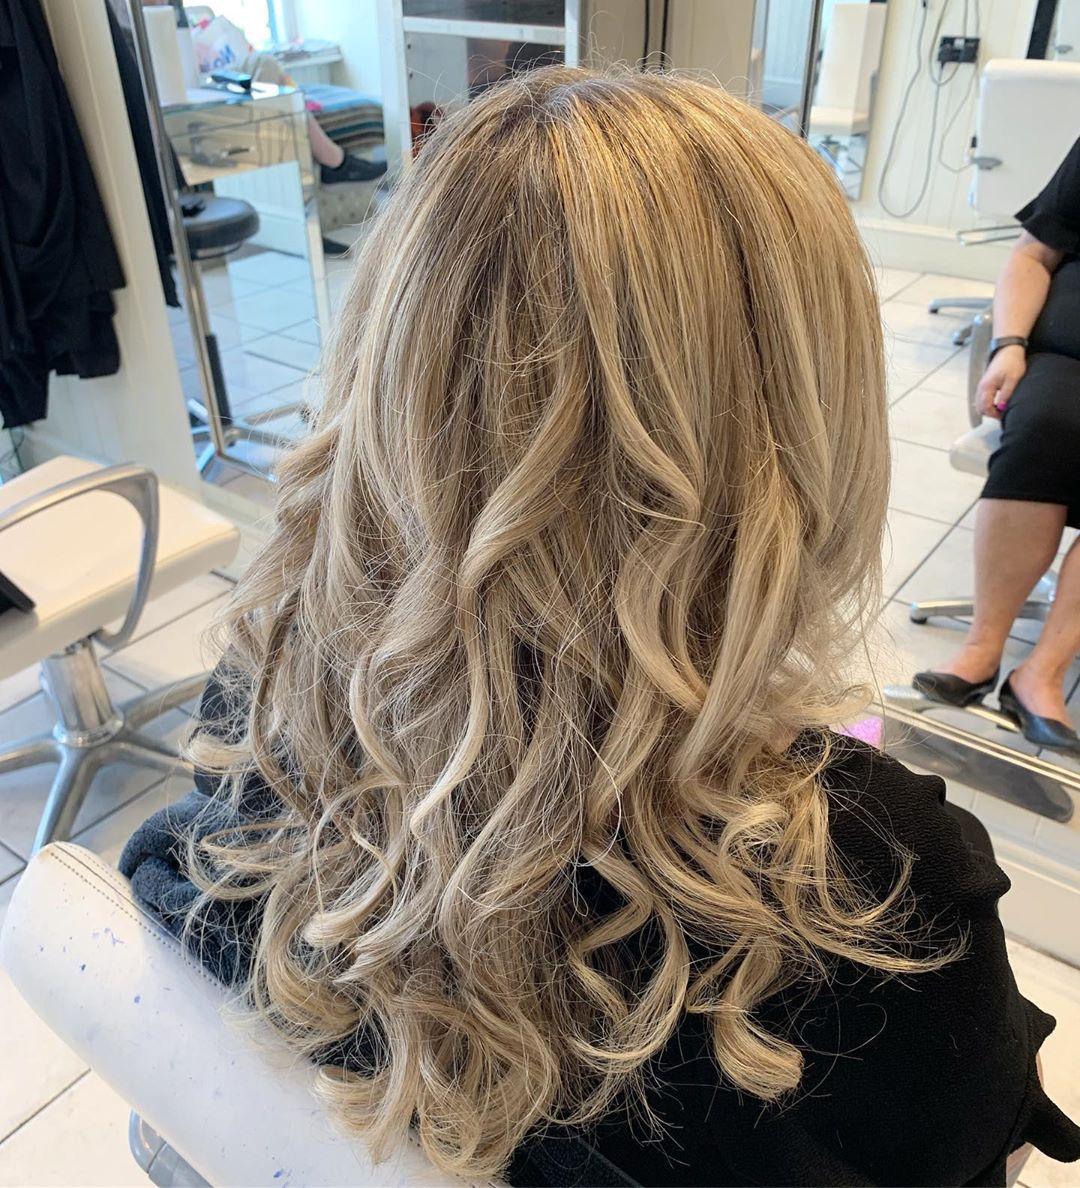 Wash And Curl Traineestylist Hairdressing Hairdresser Salon Longhair Hair Hairstyles Blondehair Curl Curlyhair Appr Sac Stilleri Uzun Sac Sac